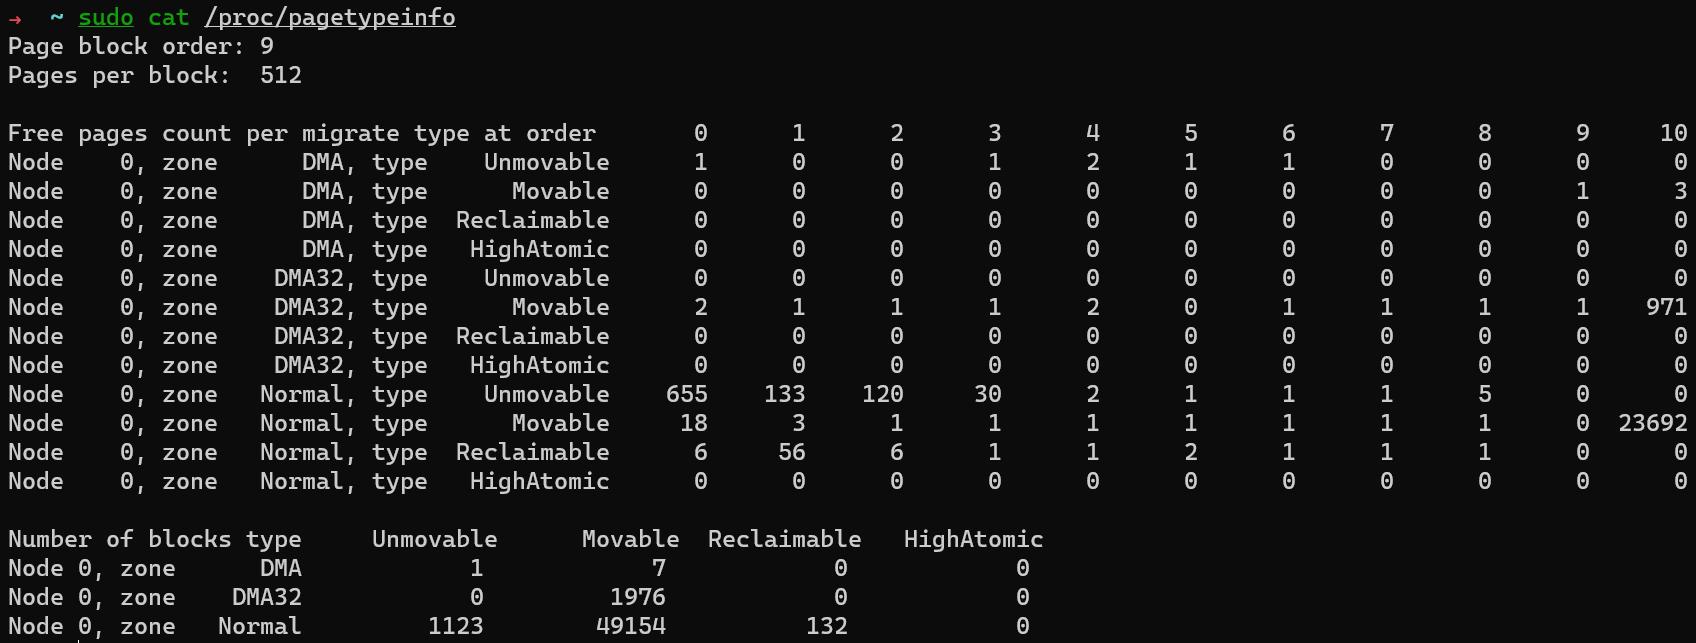 Linux `/proc/pagetypeinfo` command